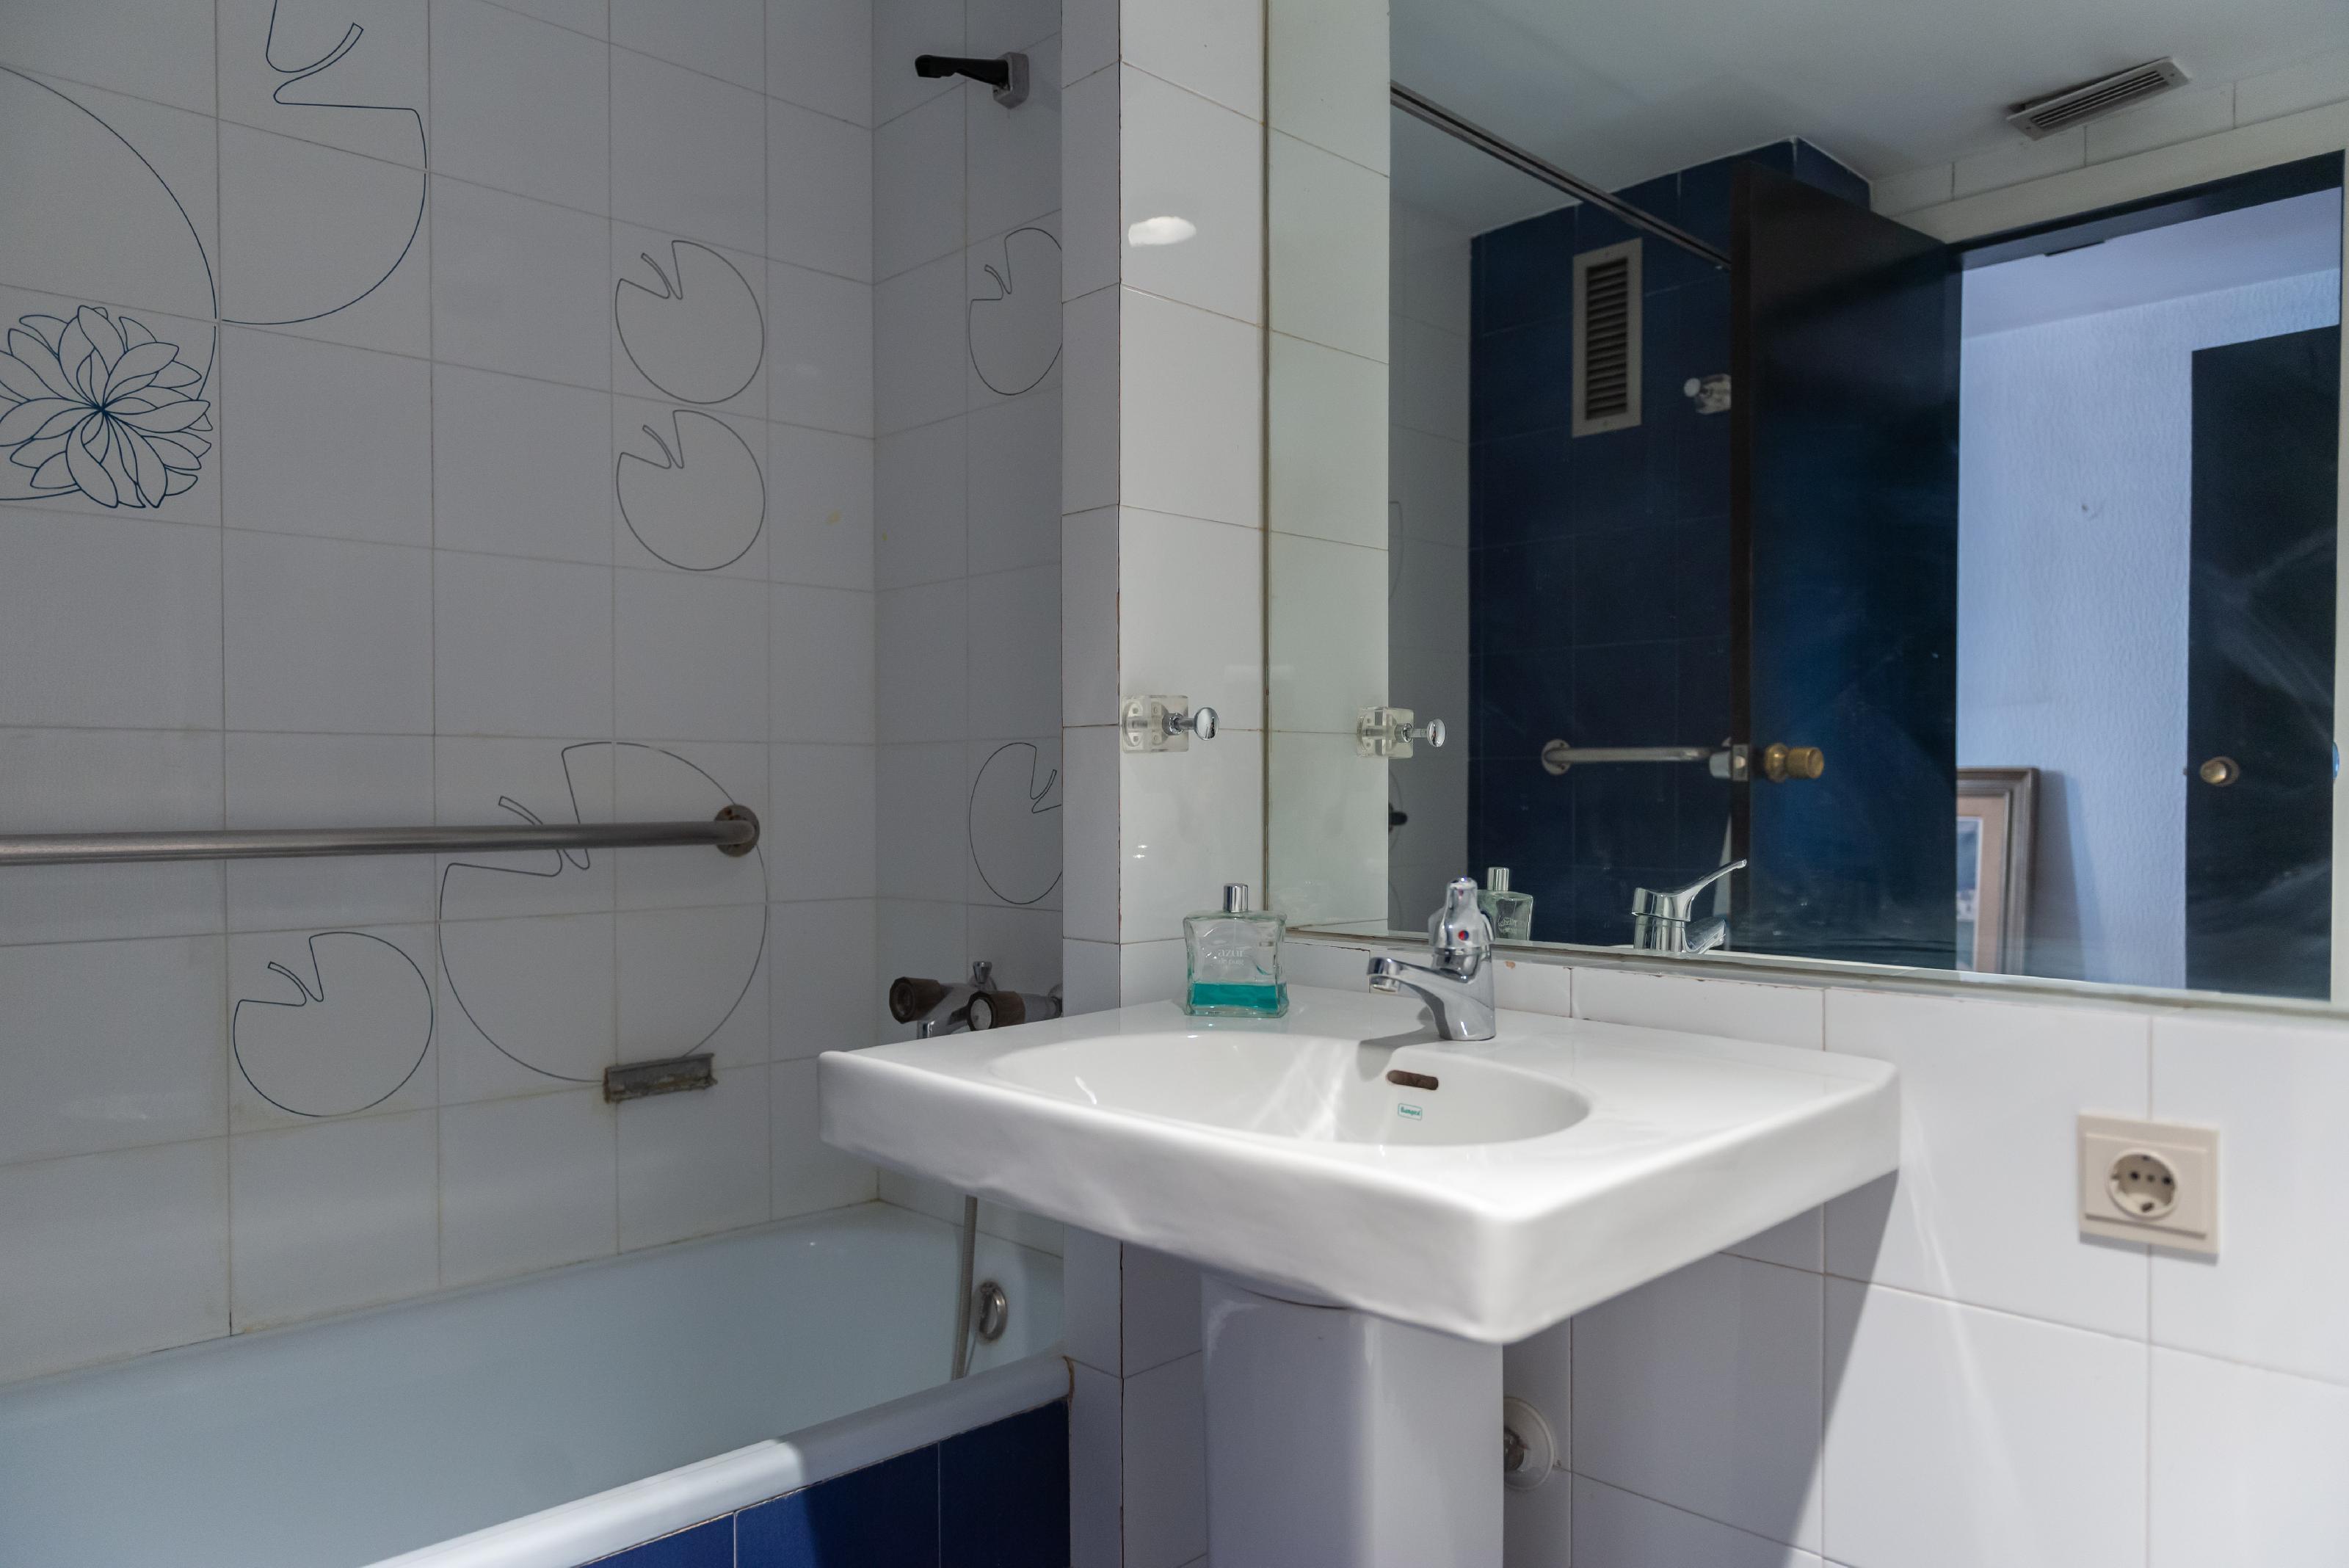 253899 Flat for sale in Sarrià-Sant Gervasi, Sant Gervasi-Galvany 31